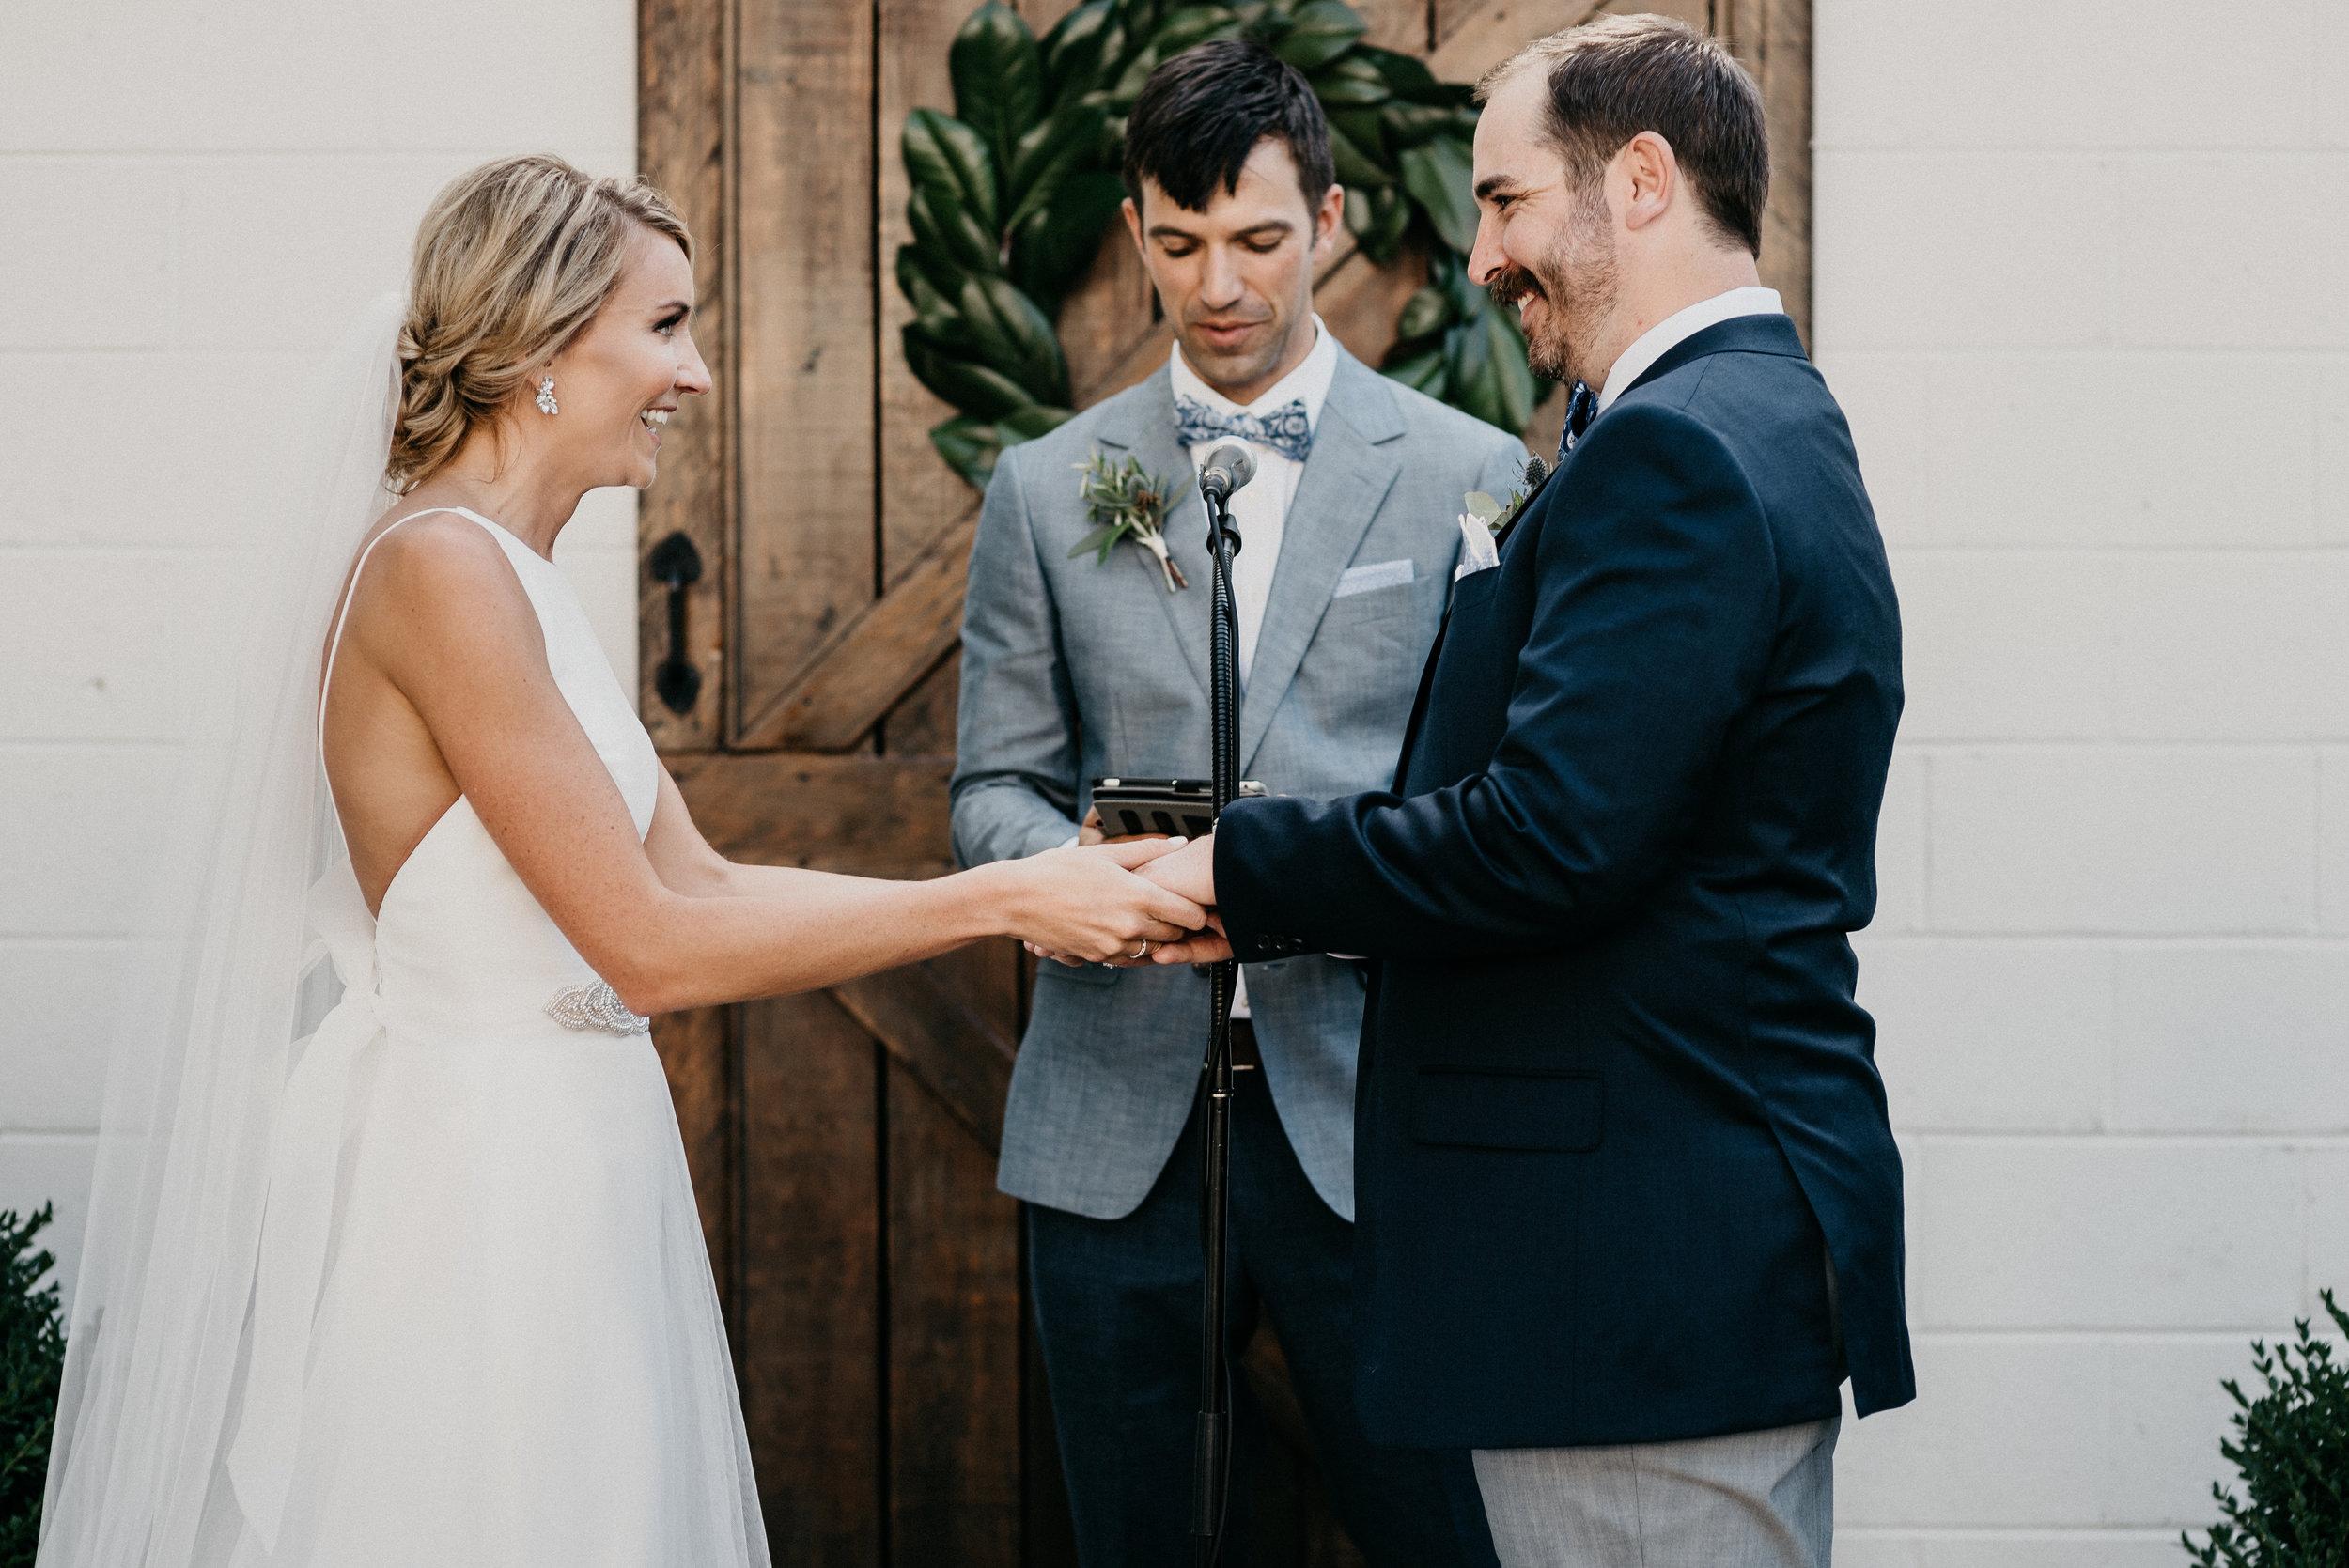 wedding planner ceremony raleigh nc